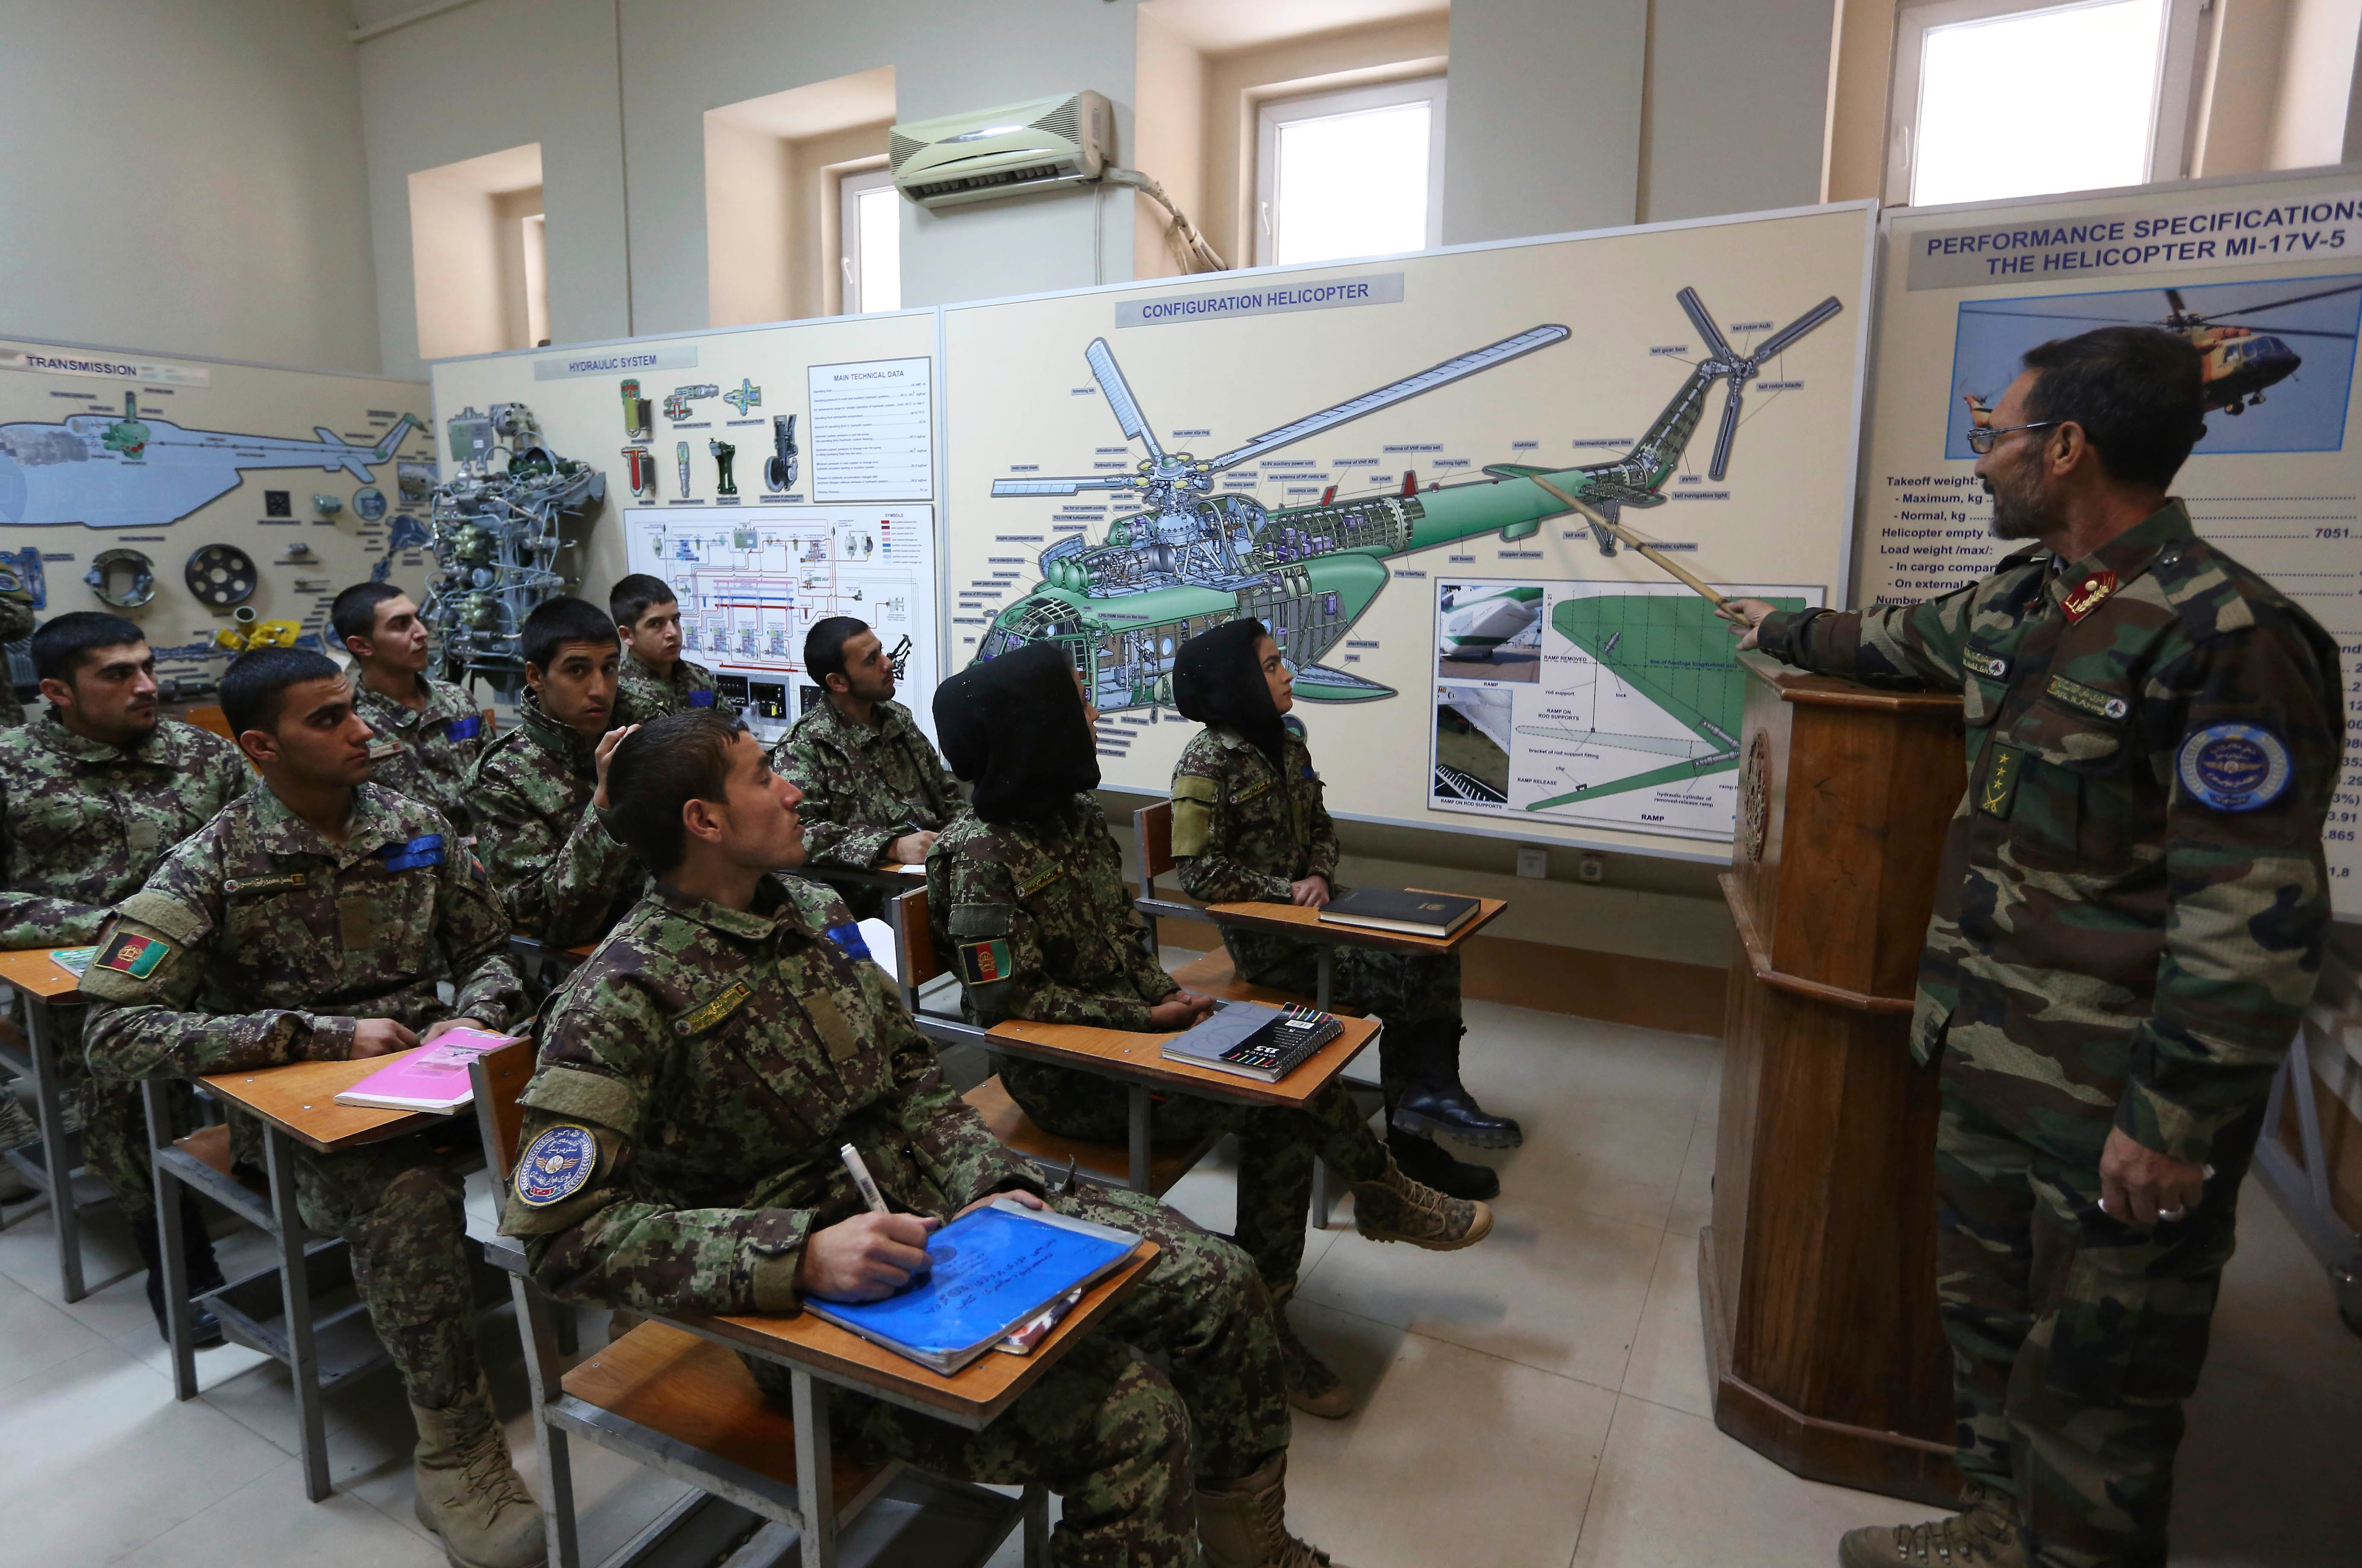 afghanistan 11117-1